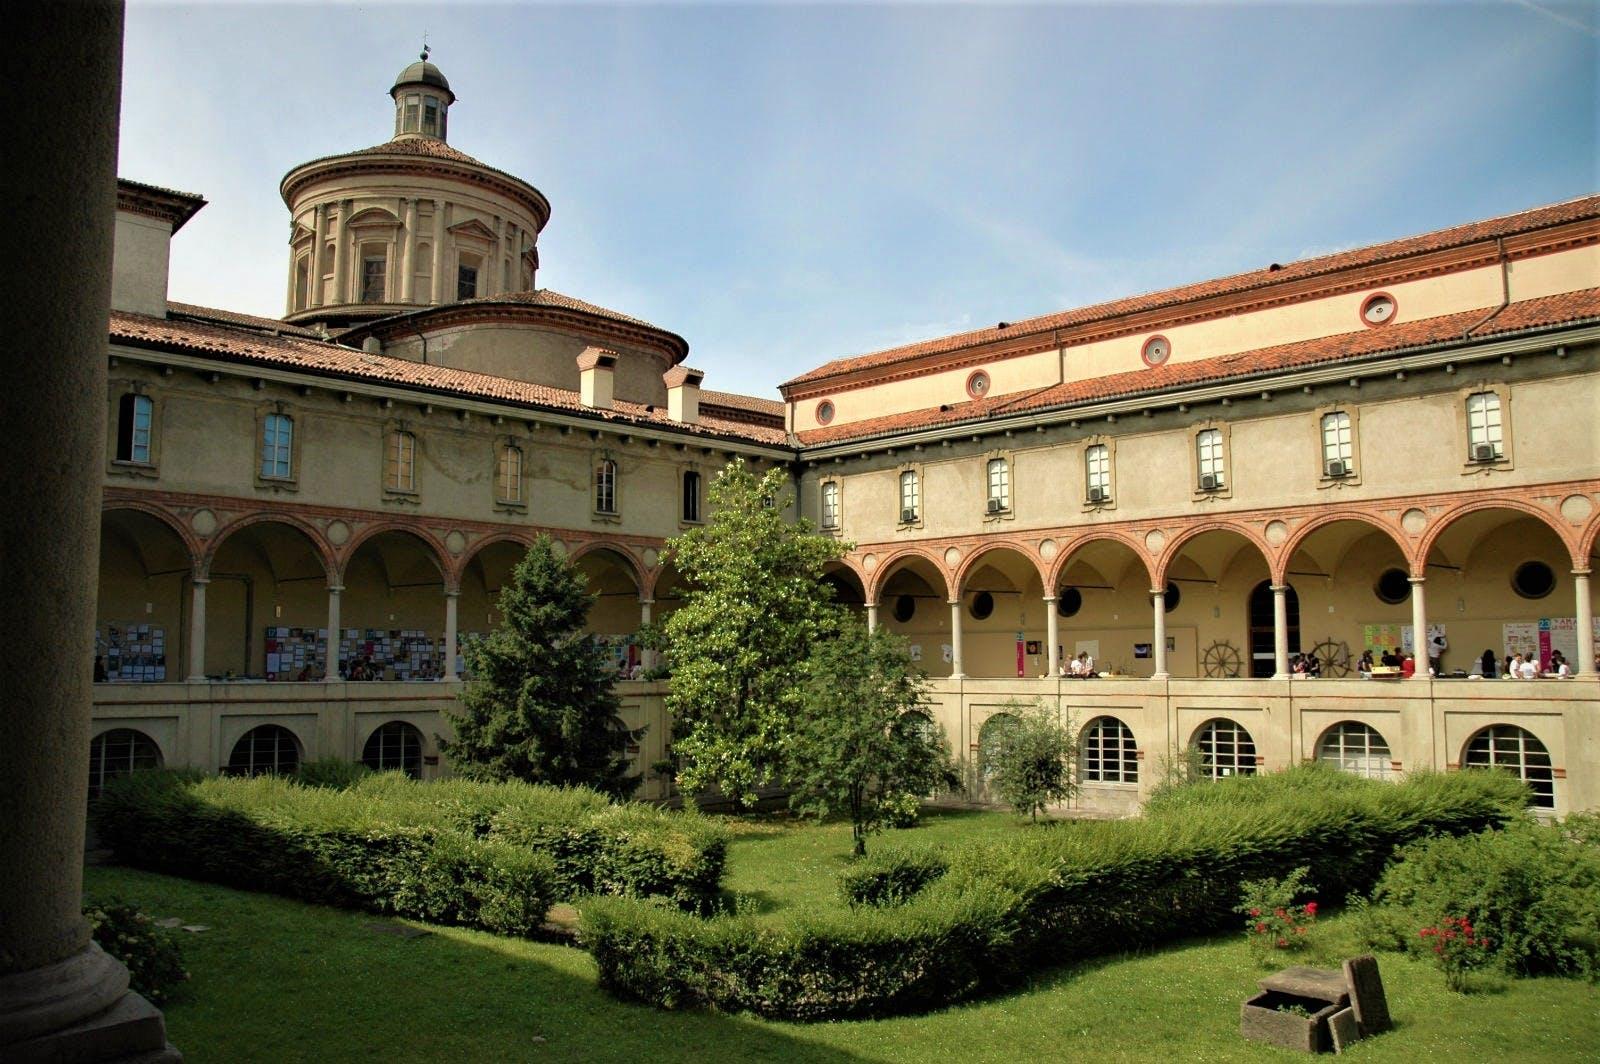 NATIONAL MUSEUM OF SCIENCE & TECHNOLOGY LEONARDO DA VINCI